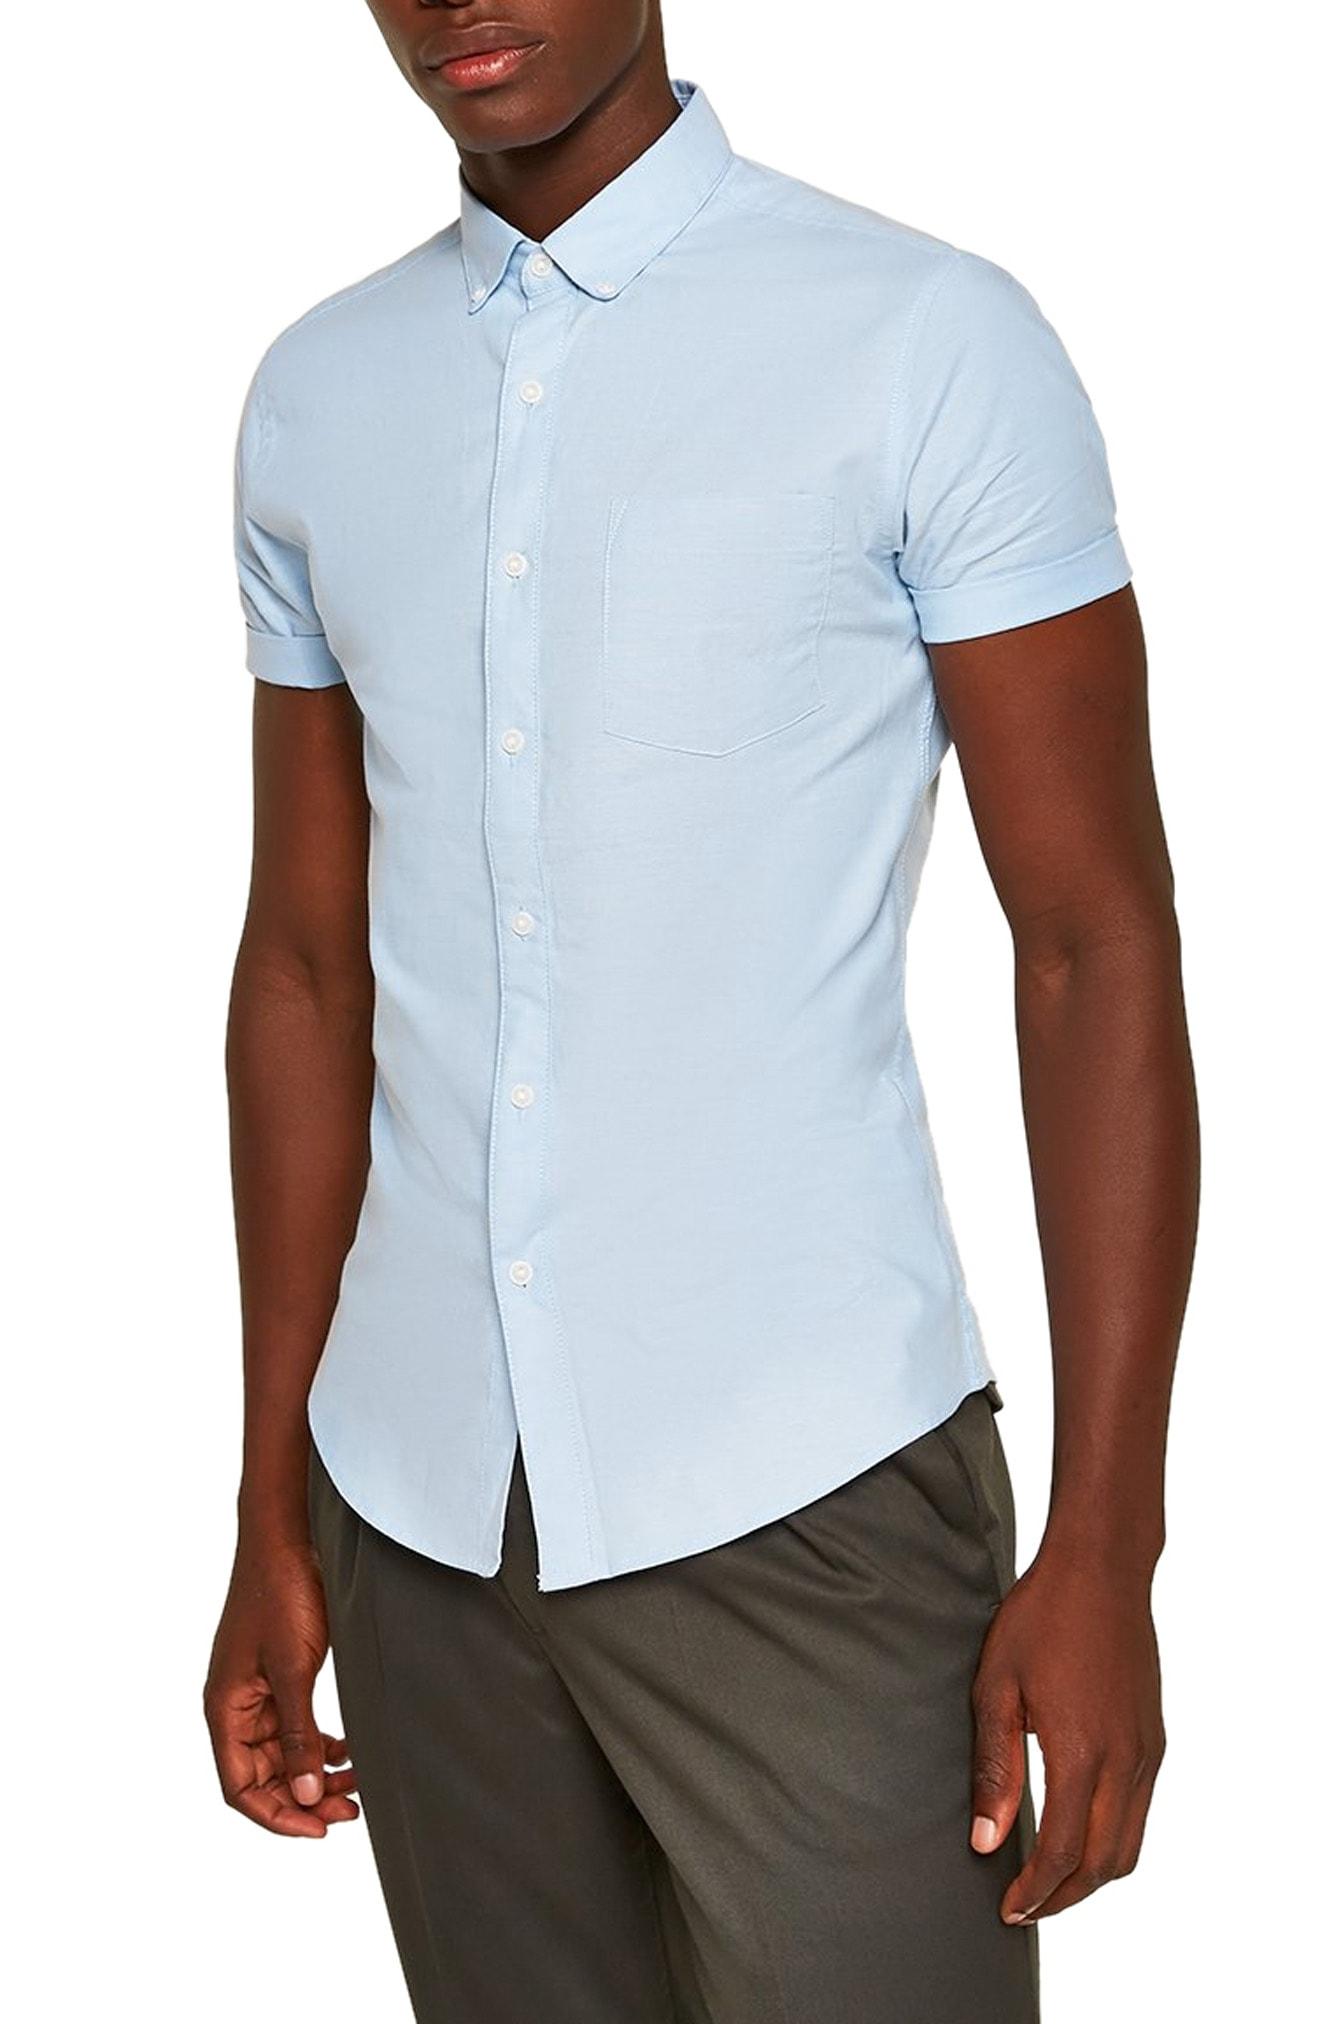 aa6aa9f9507 Men s Topman Muscle Fit Oxford Shirt